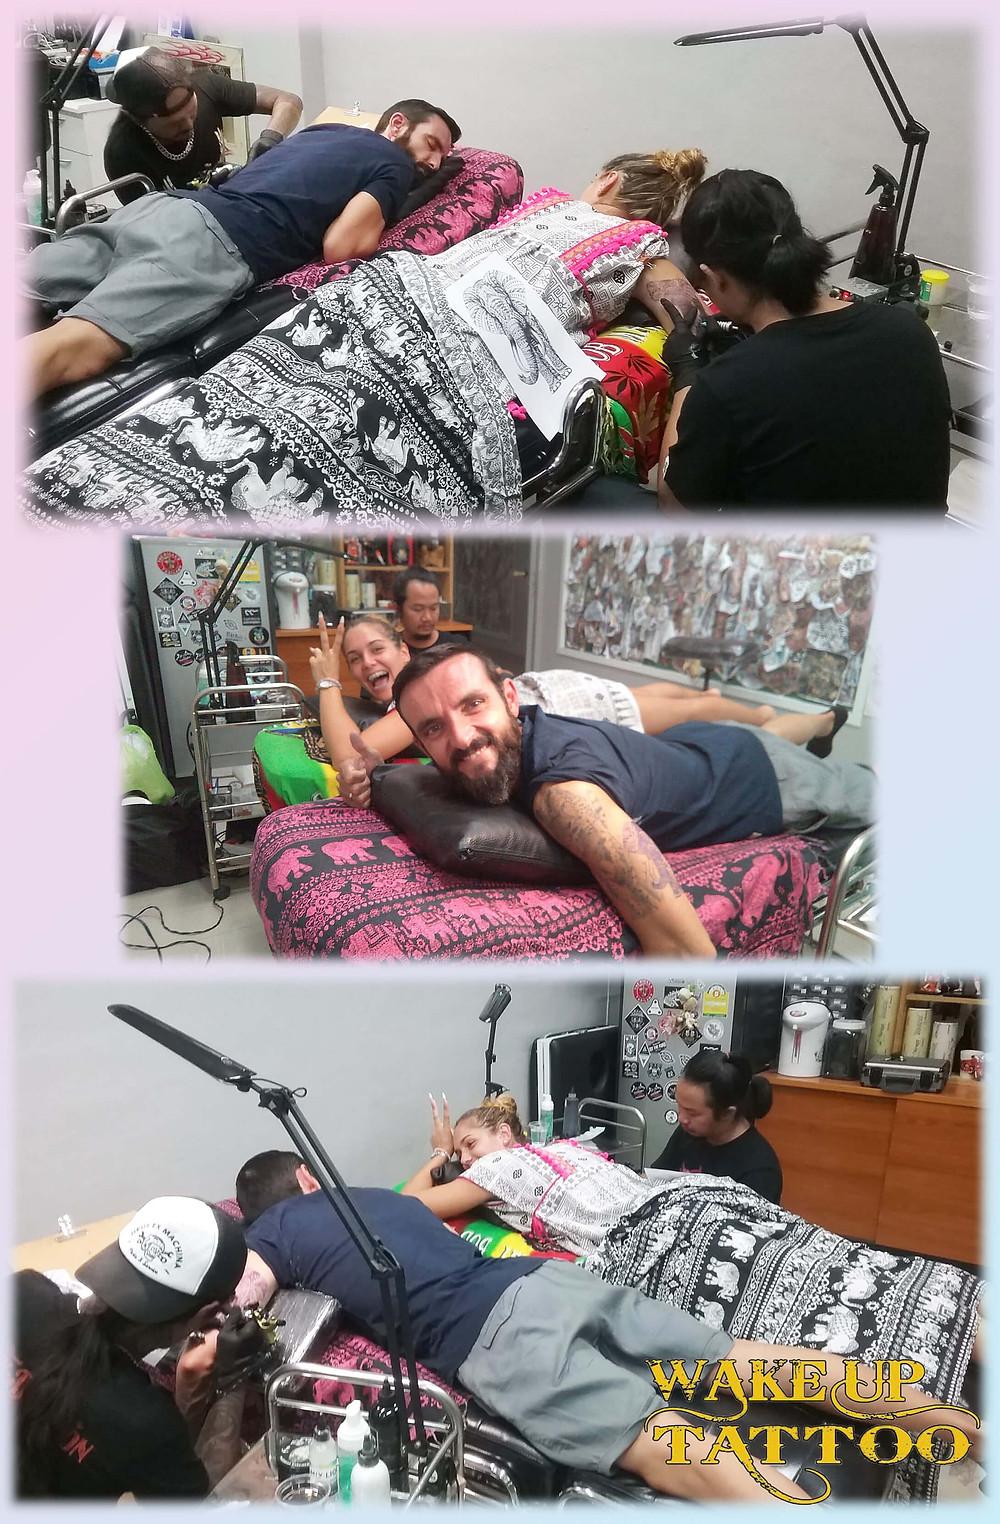 Enjoy tattoo time by Wake up Tattoo Phuket in Patong